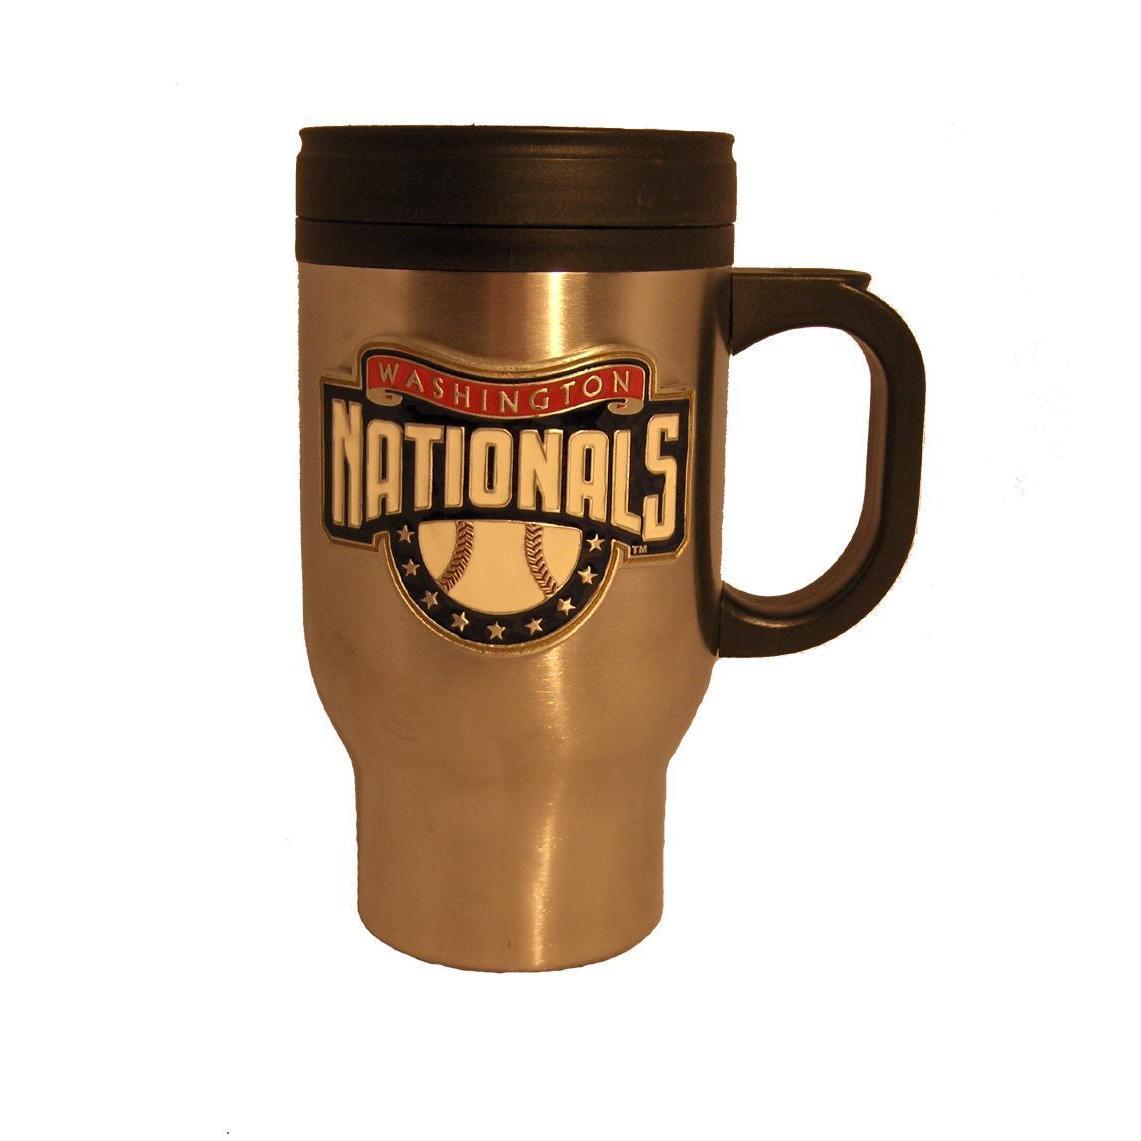 Overstock.com Washington Nationals Stainless Steel Travel Coffee Mug